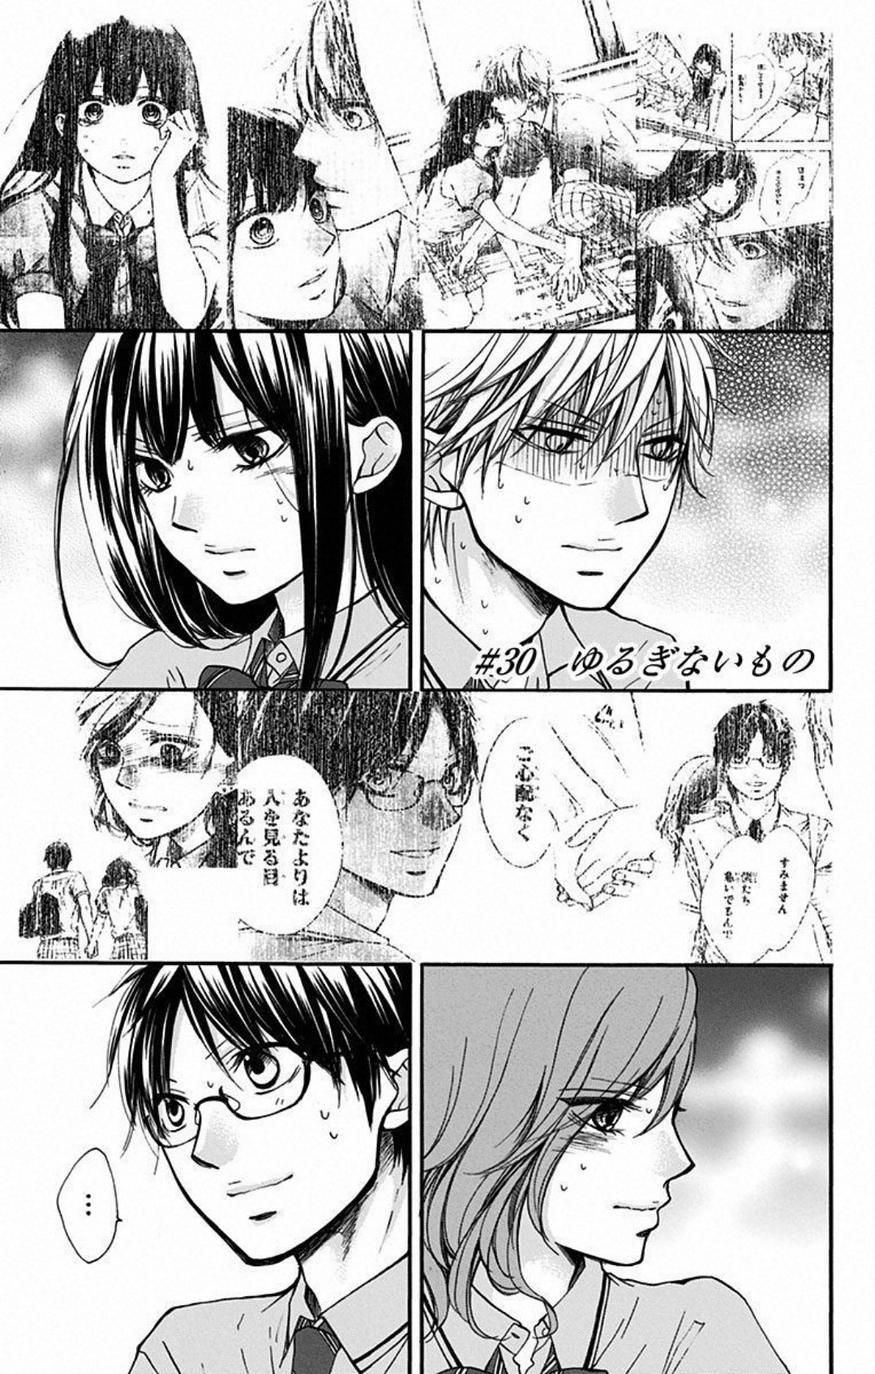 Kono Oto Tomare! - Chapter 30 - Page 1